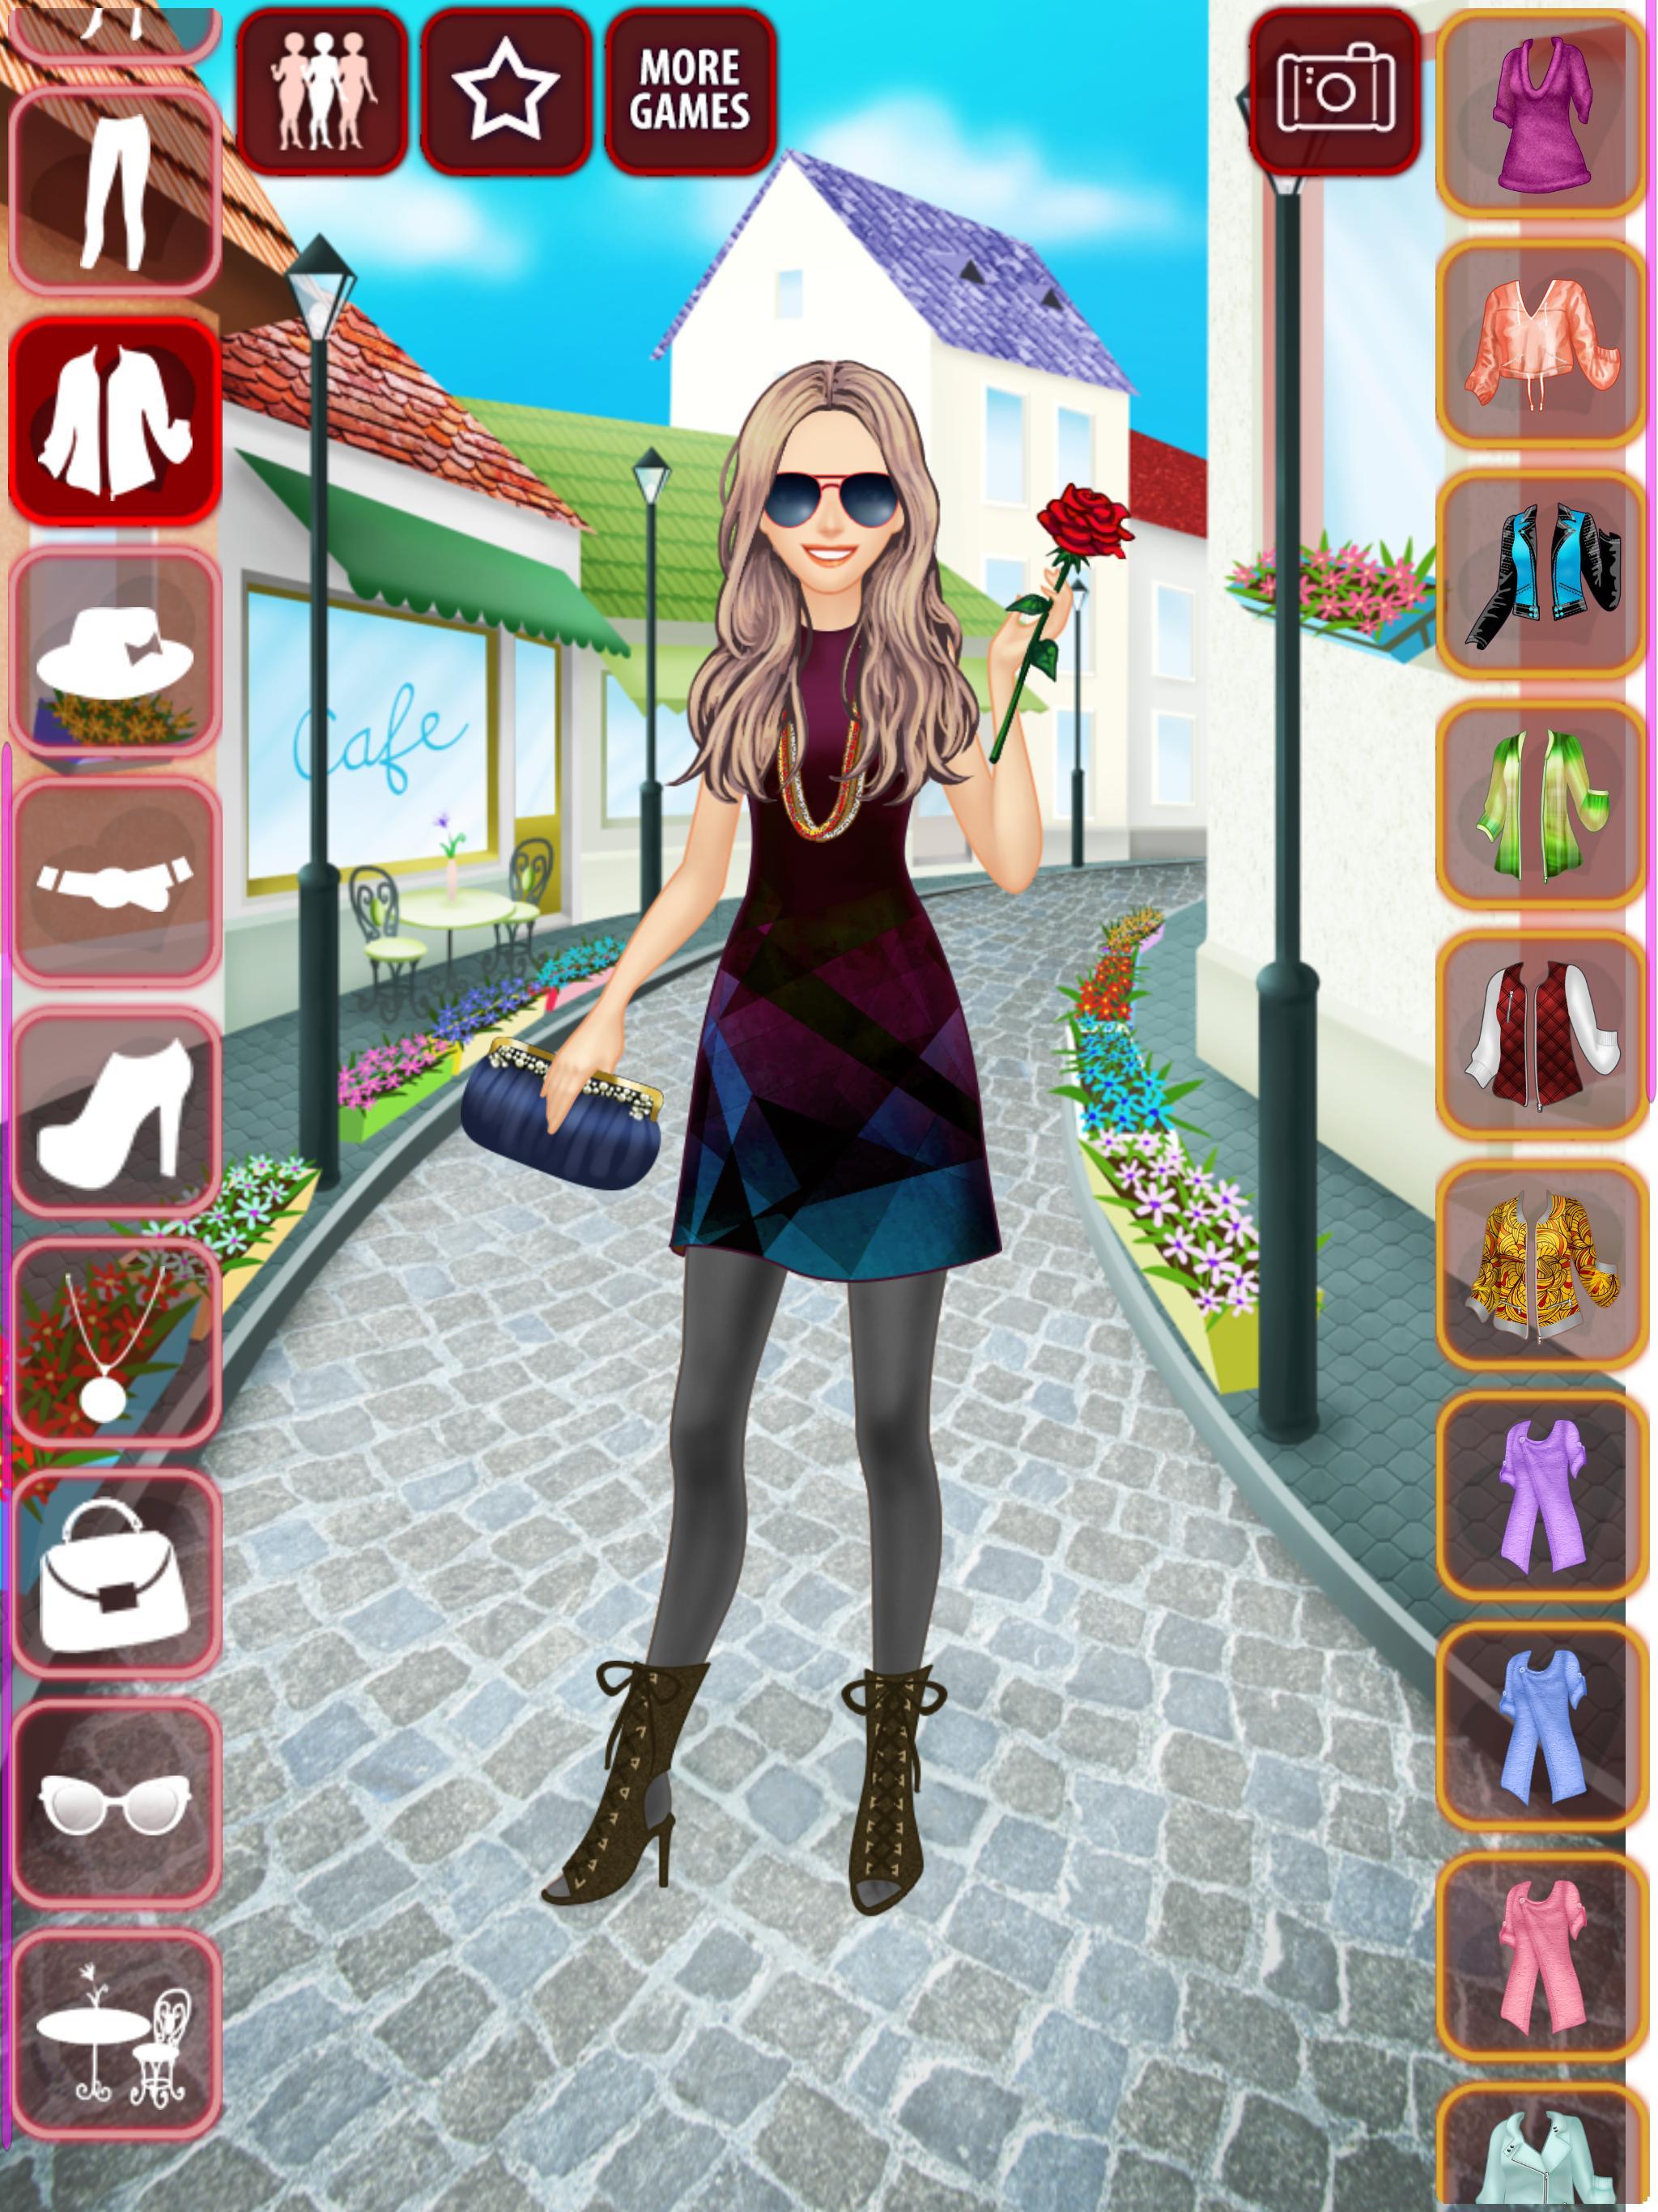 3a46ab99d لعبة تلبيس ملابس اللقاء للبنات for Android - APK Download